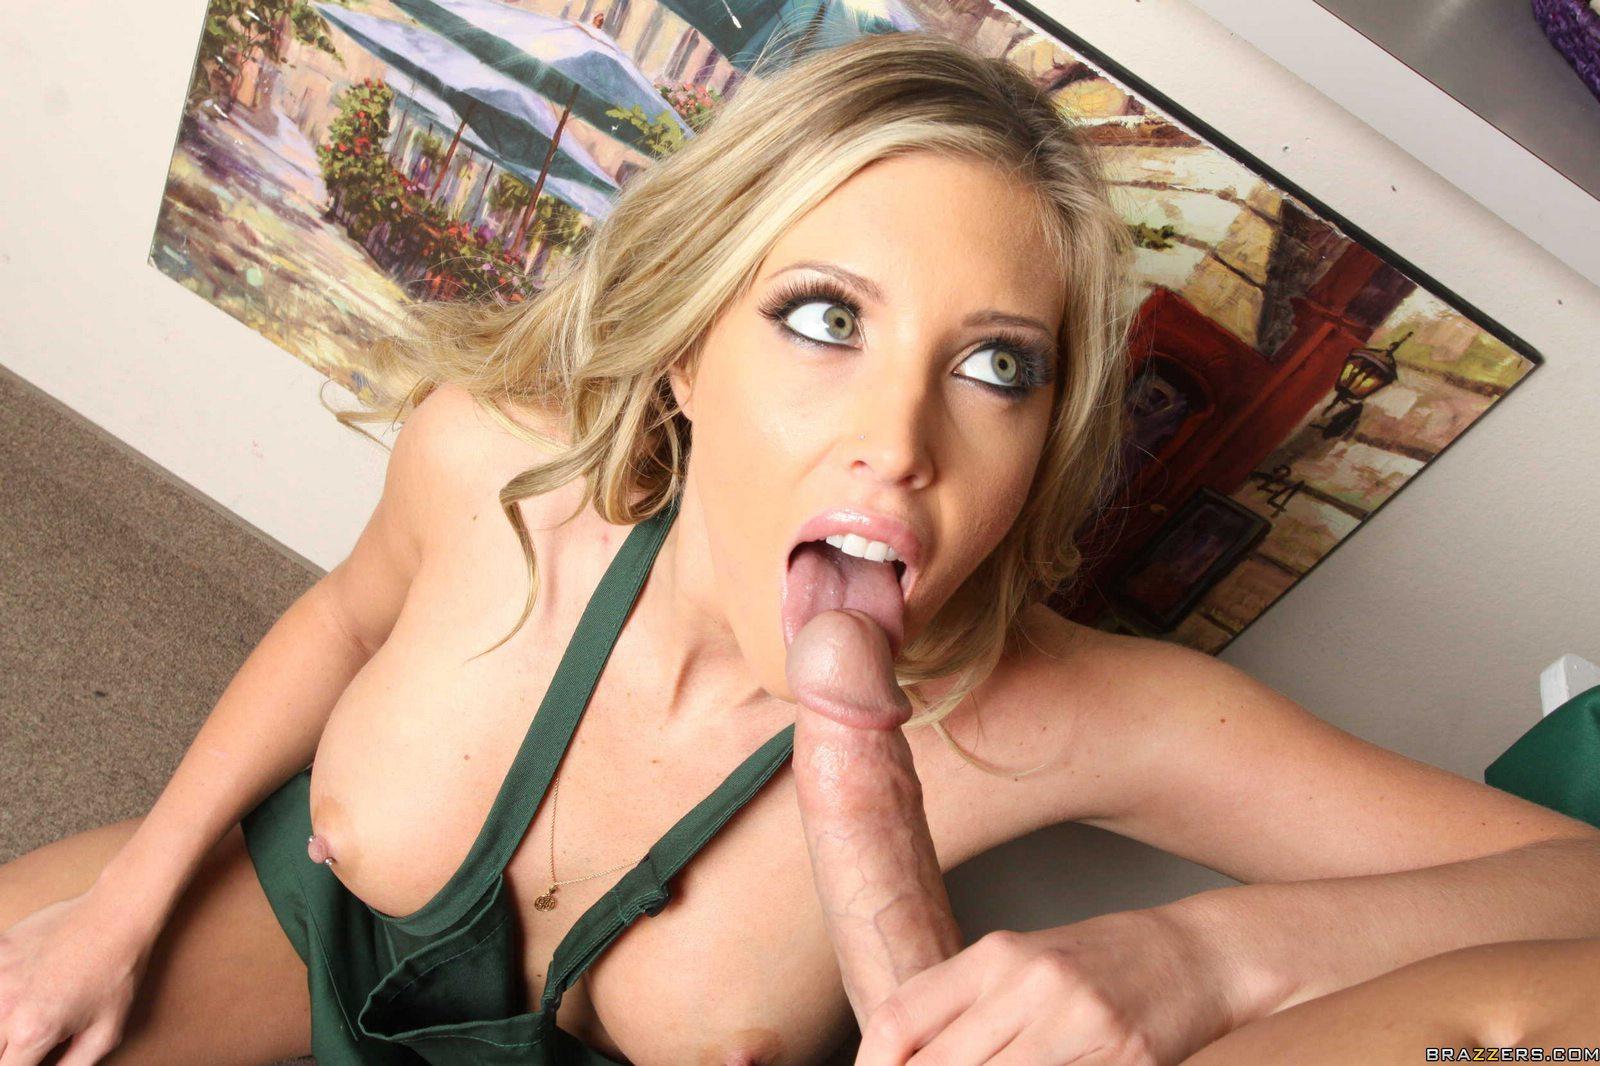 Porn daisy rock anal